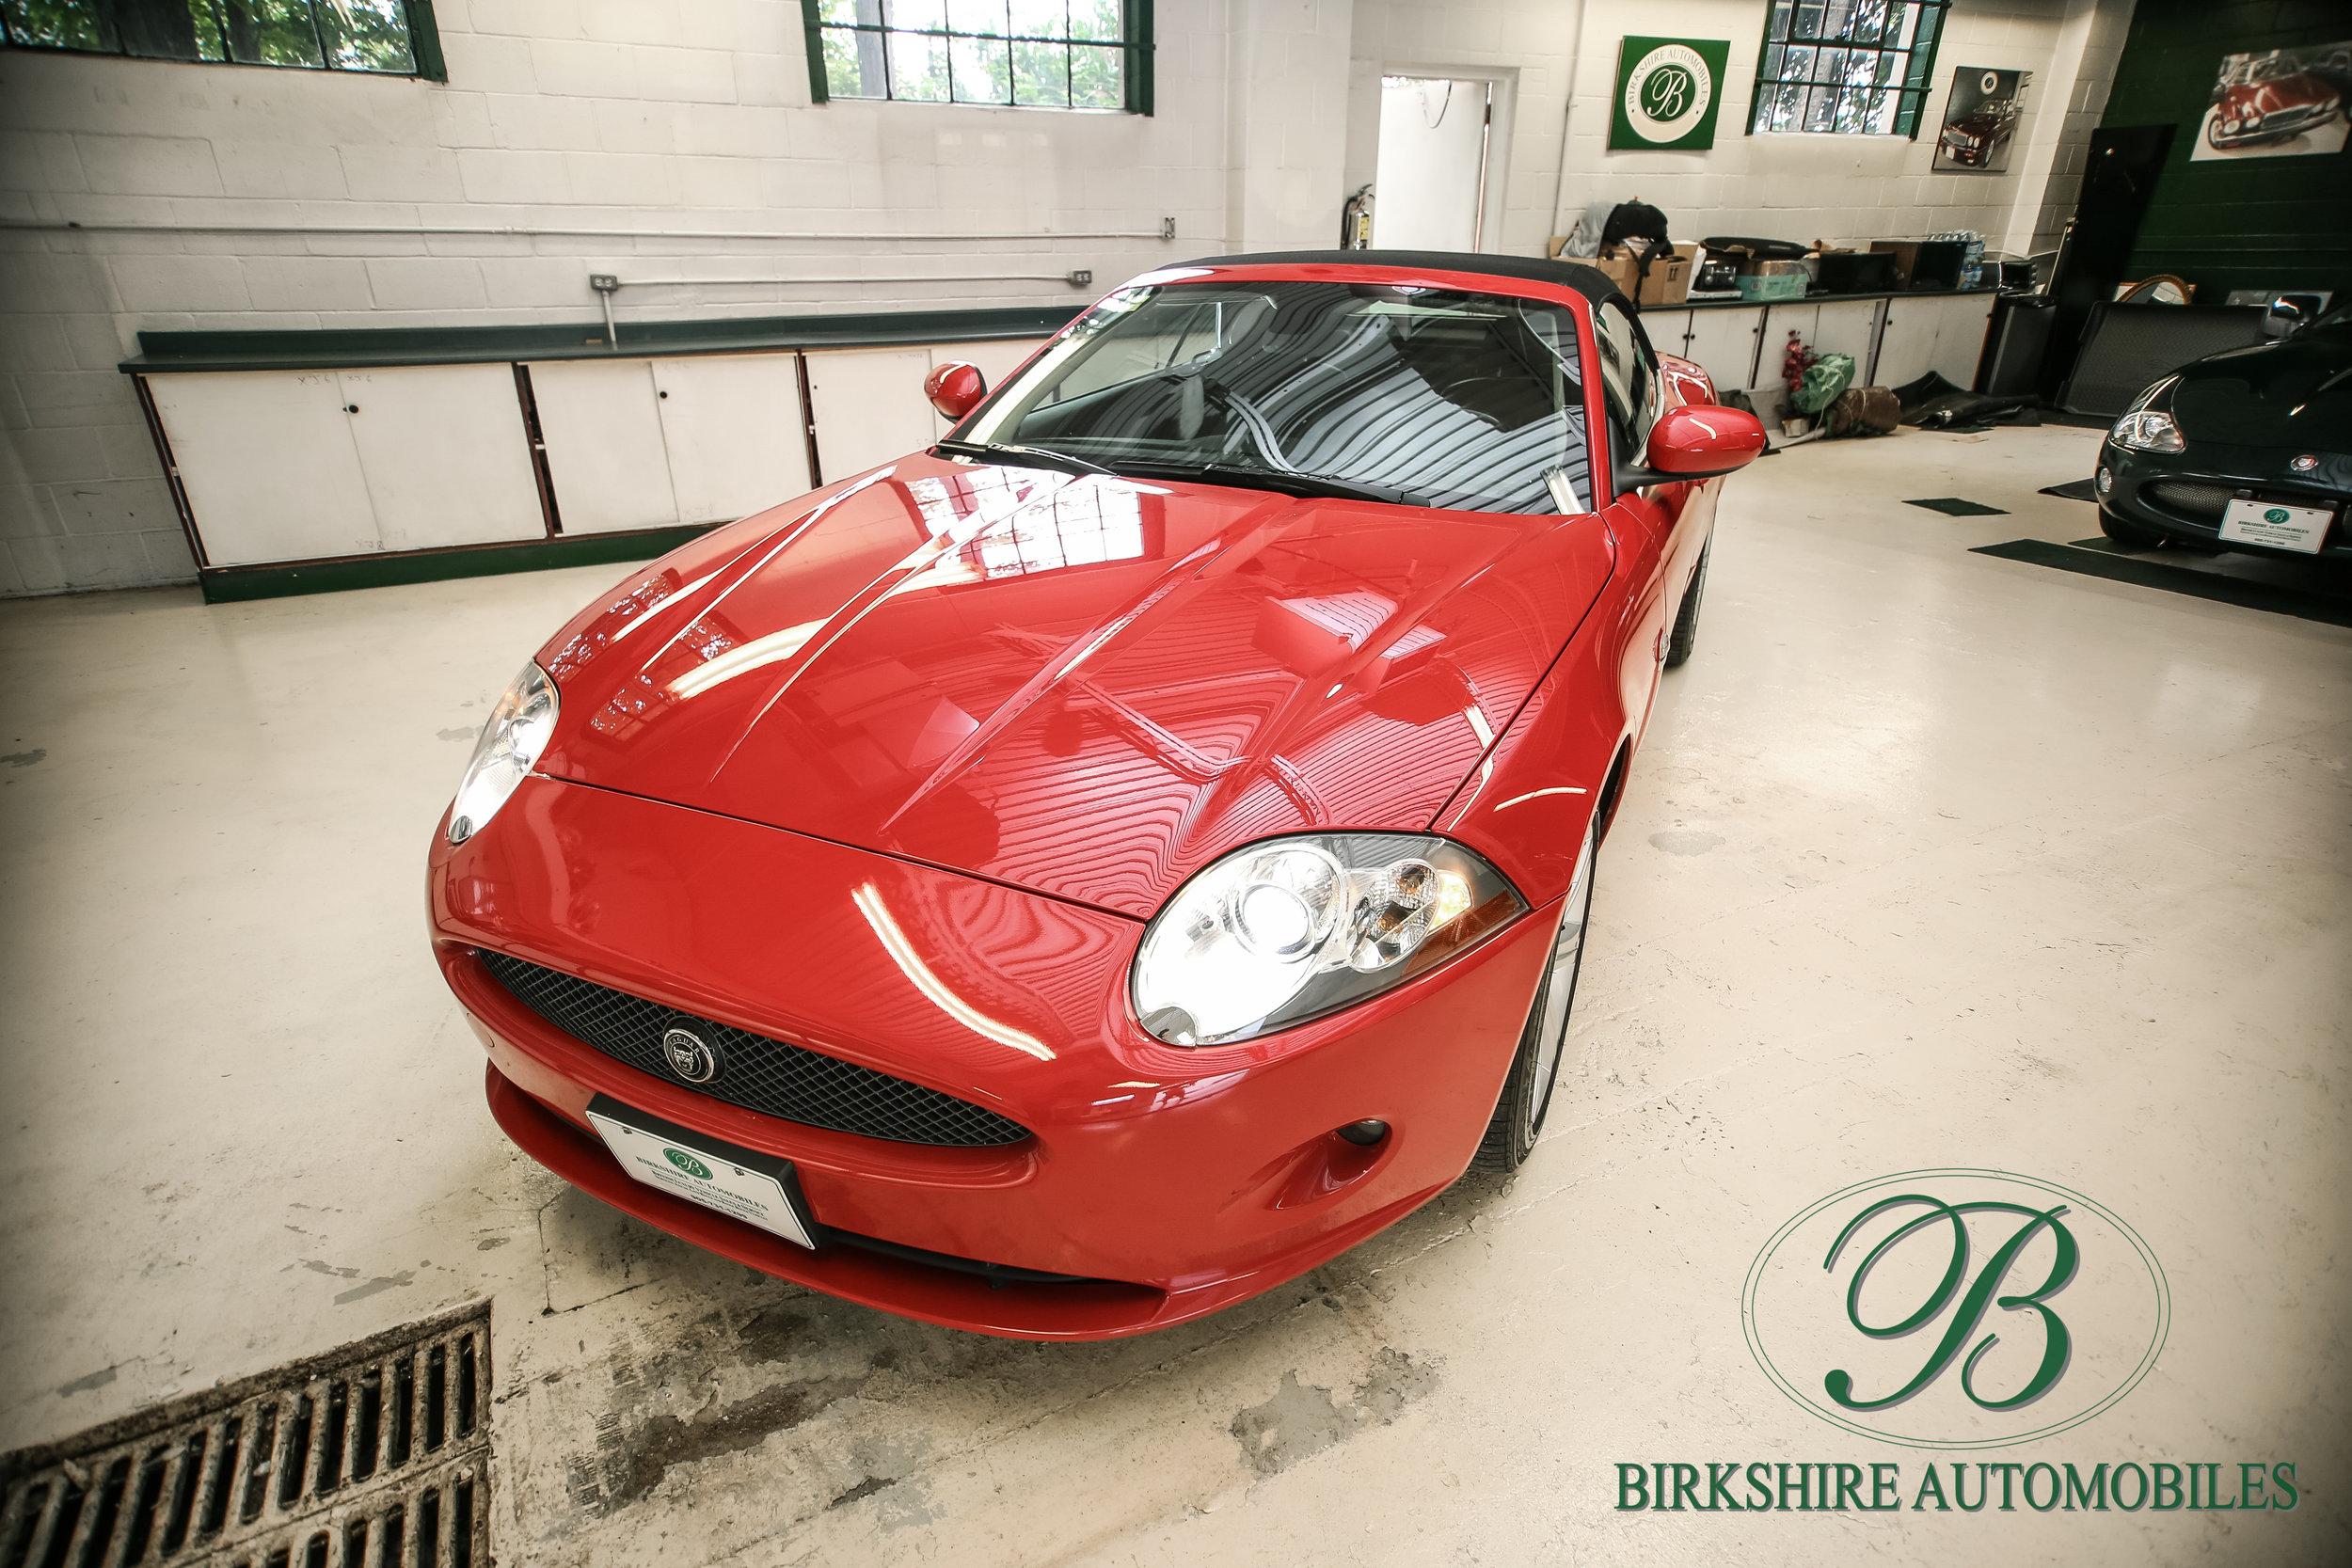 Birkshire Automobiles-68.jpg